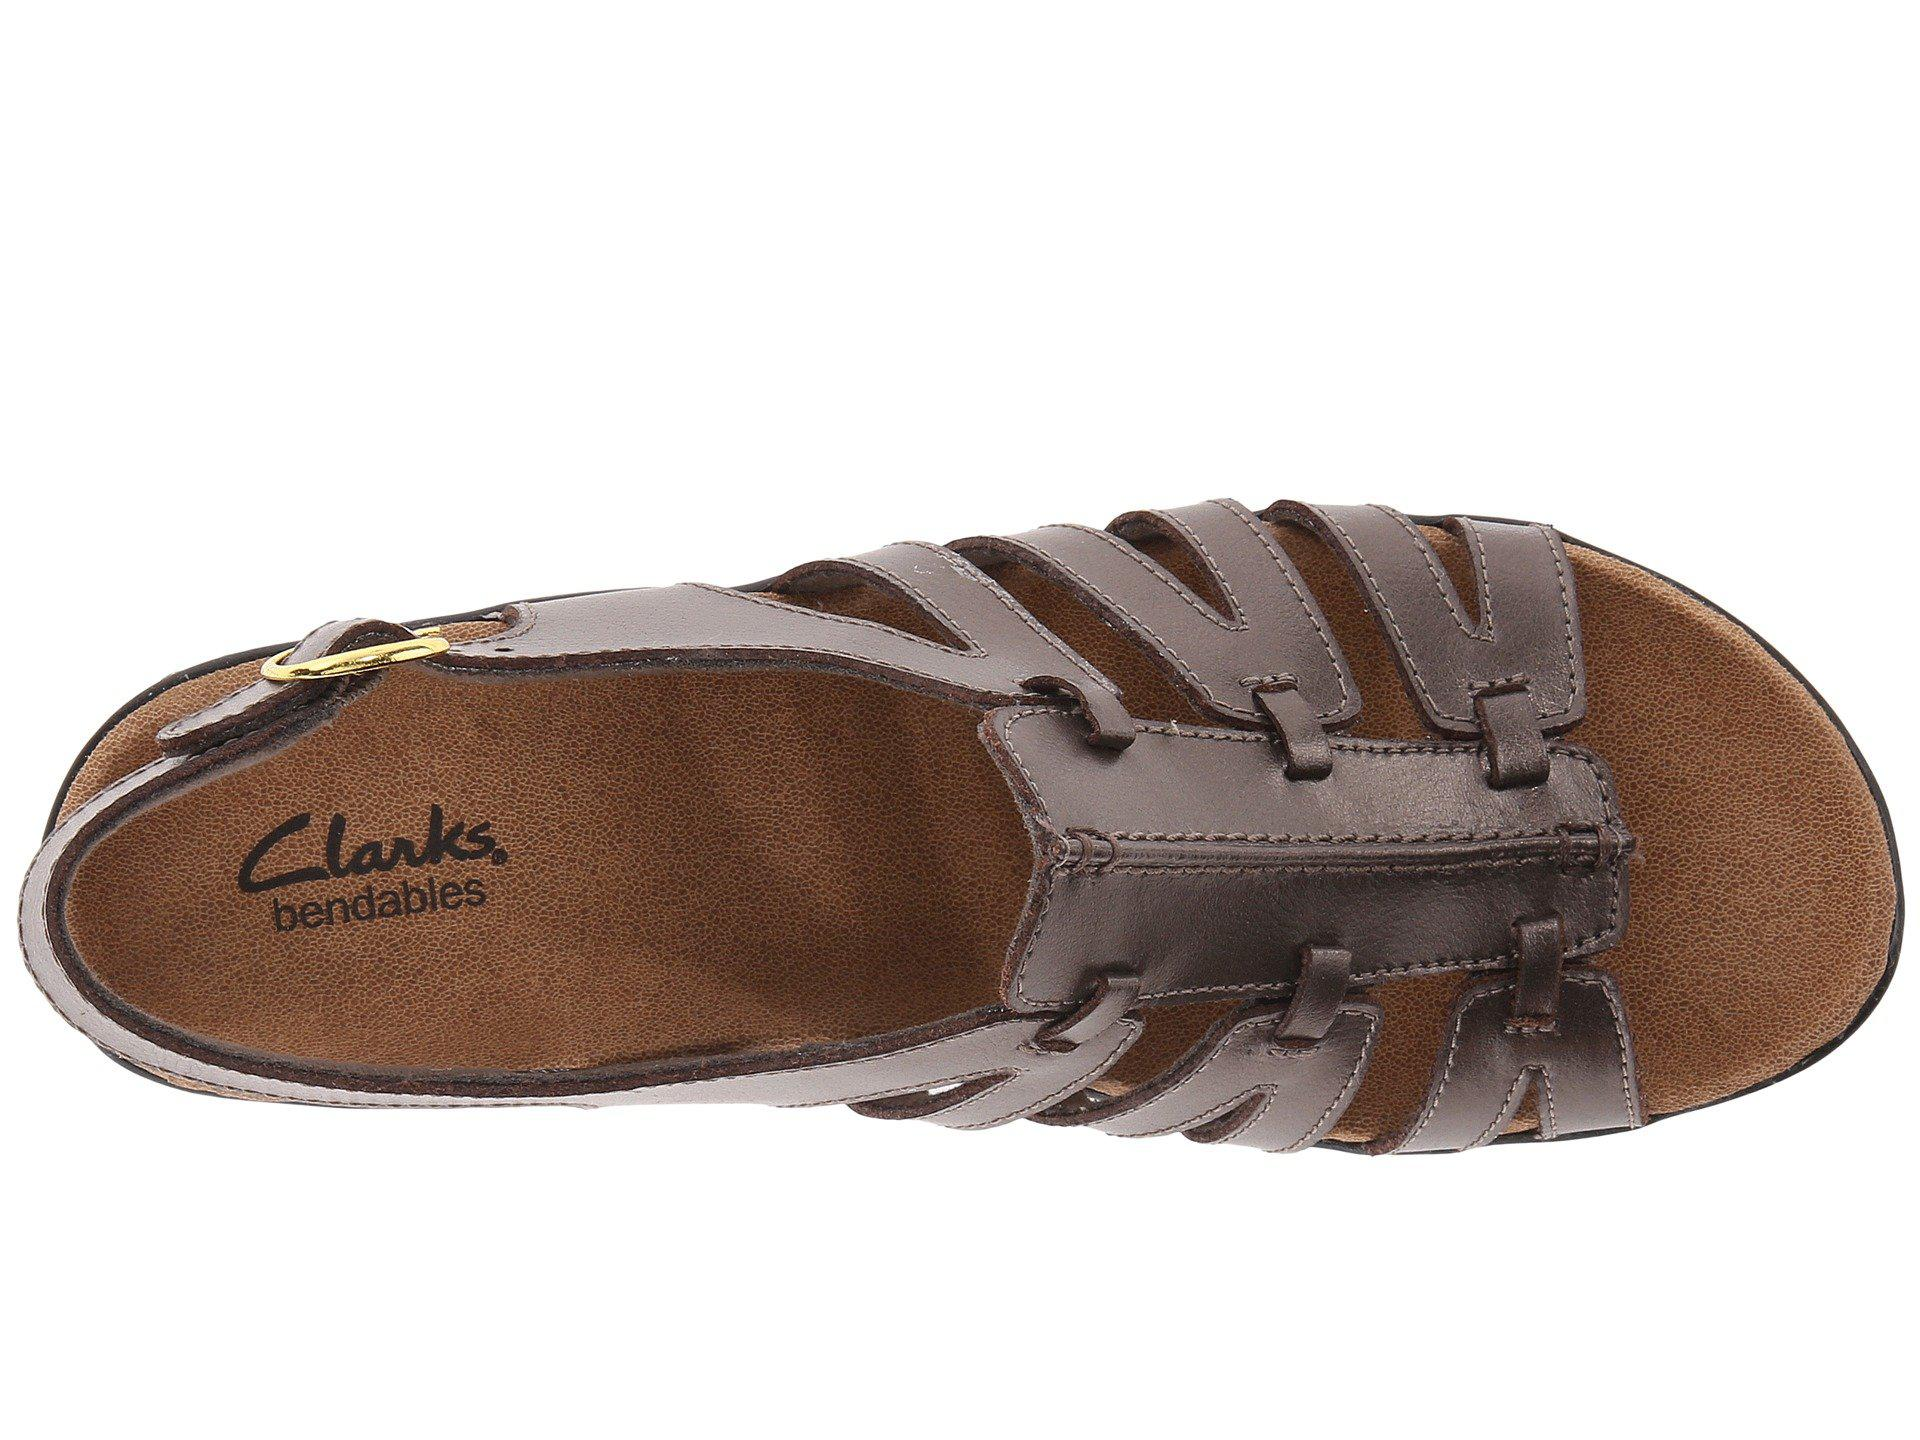 8cc62d491 Clarks - Metallic Lexi Marigold Q (white Leather) Women s Sandals - Lyst.  View fullscreen